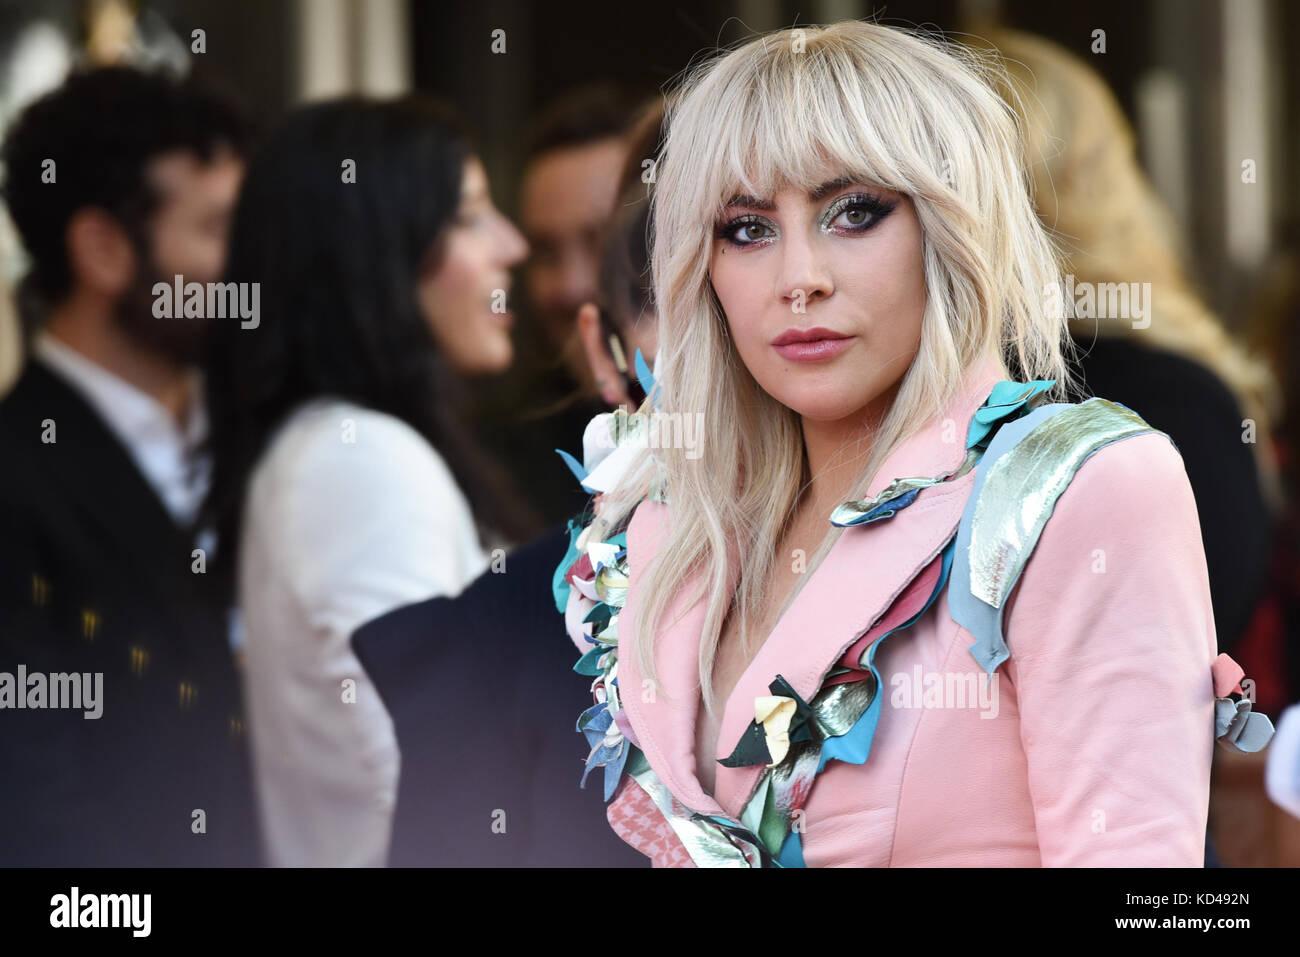 Xlii toronto international film festival - Lady Gaga photocall con: Lady Gaga dove: toronto, Canada quando: 08 set Immagini Stock